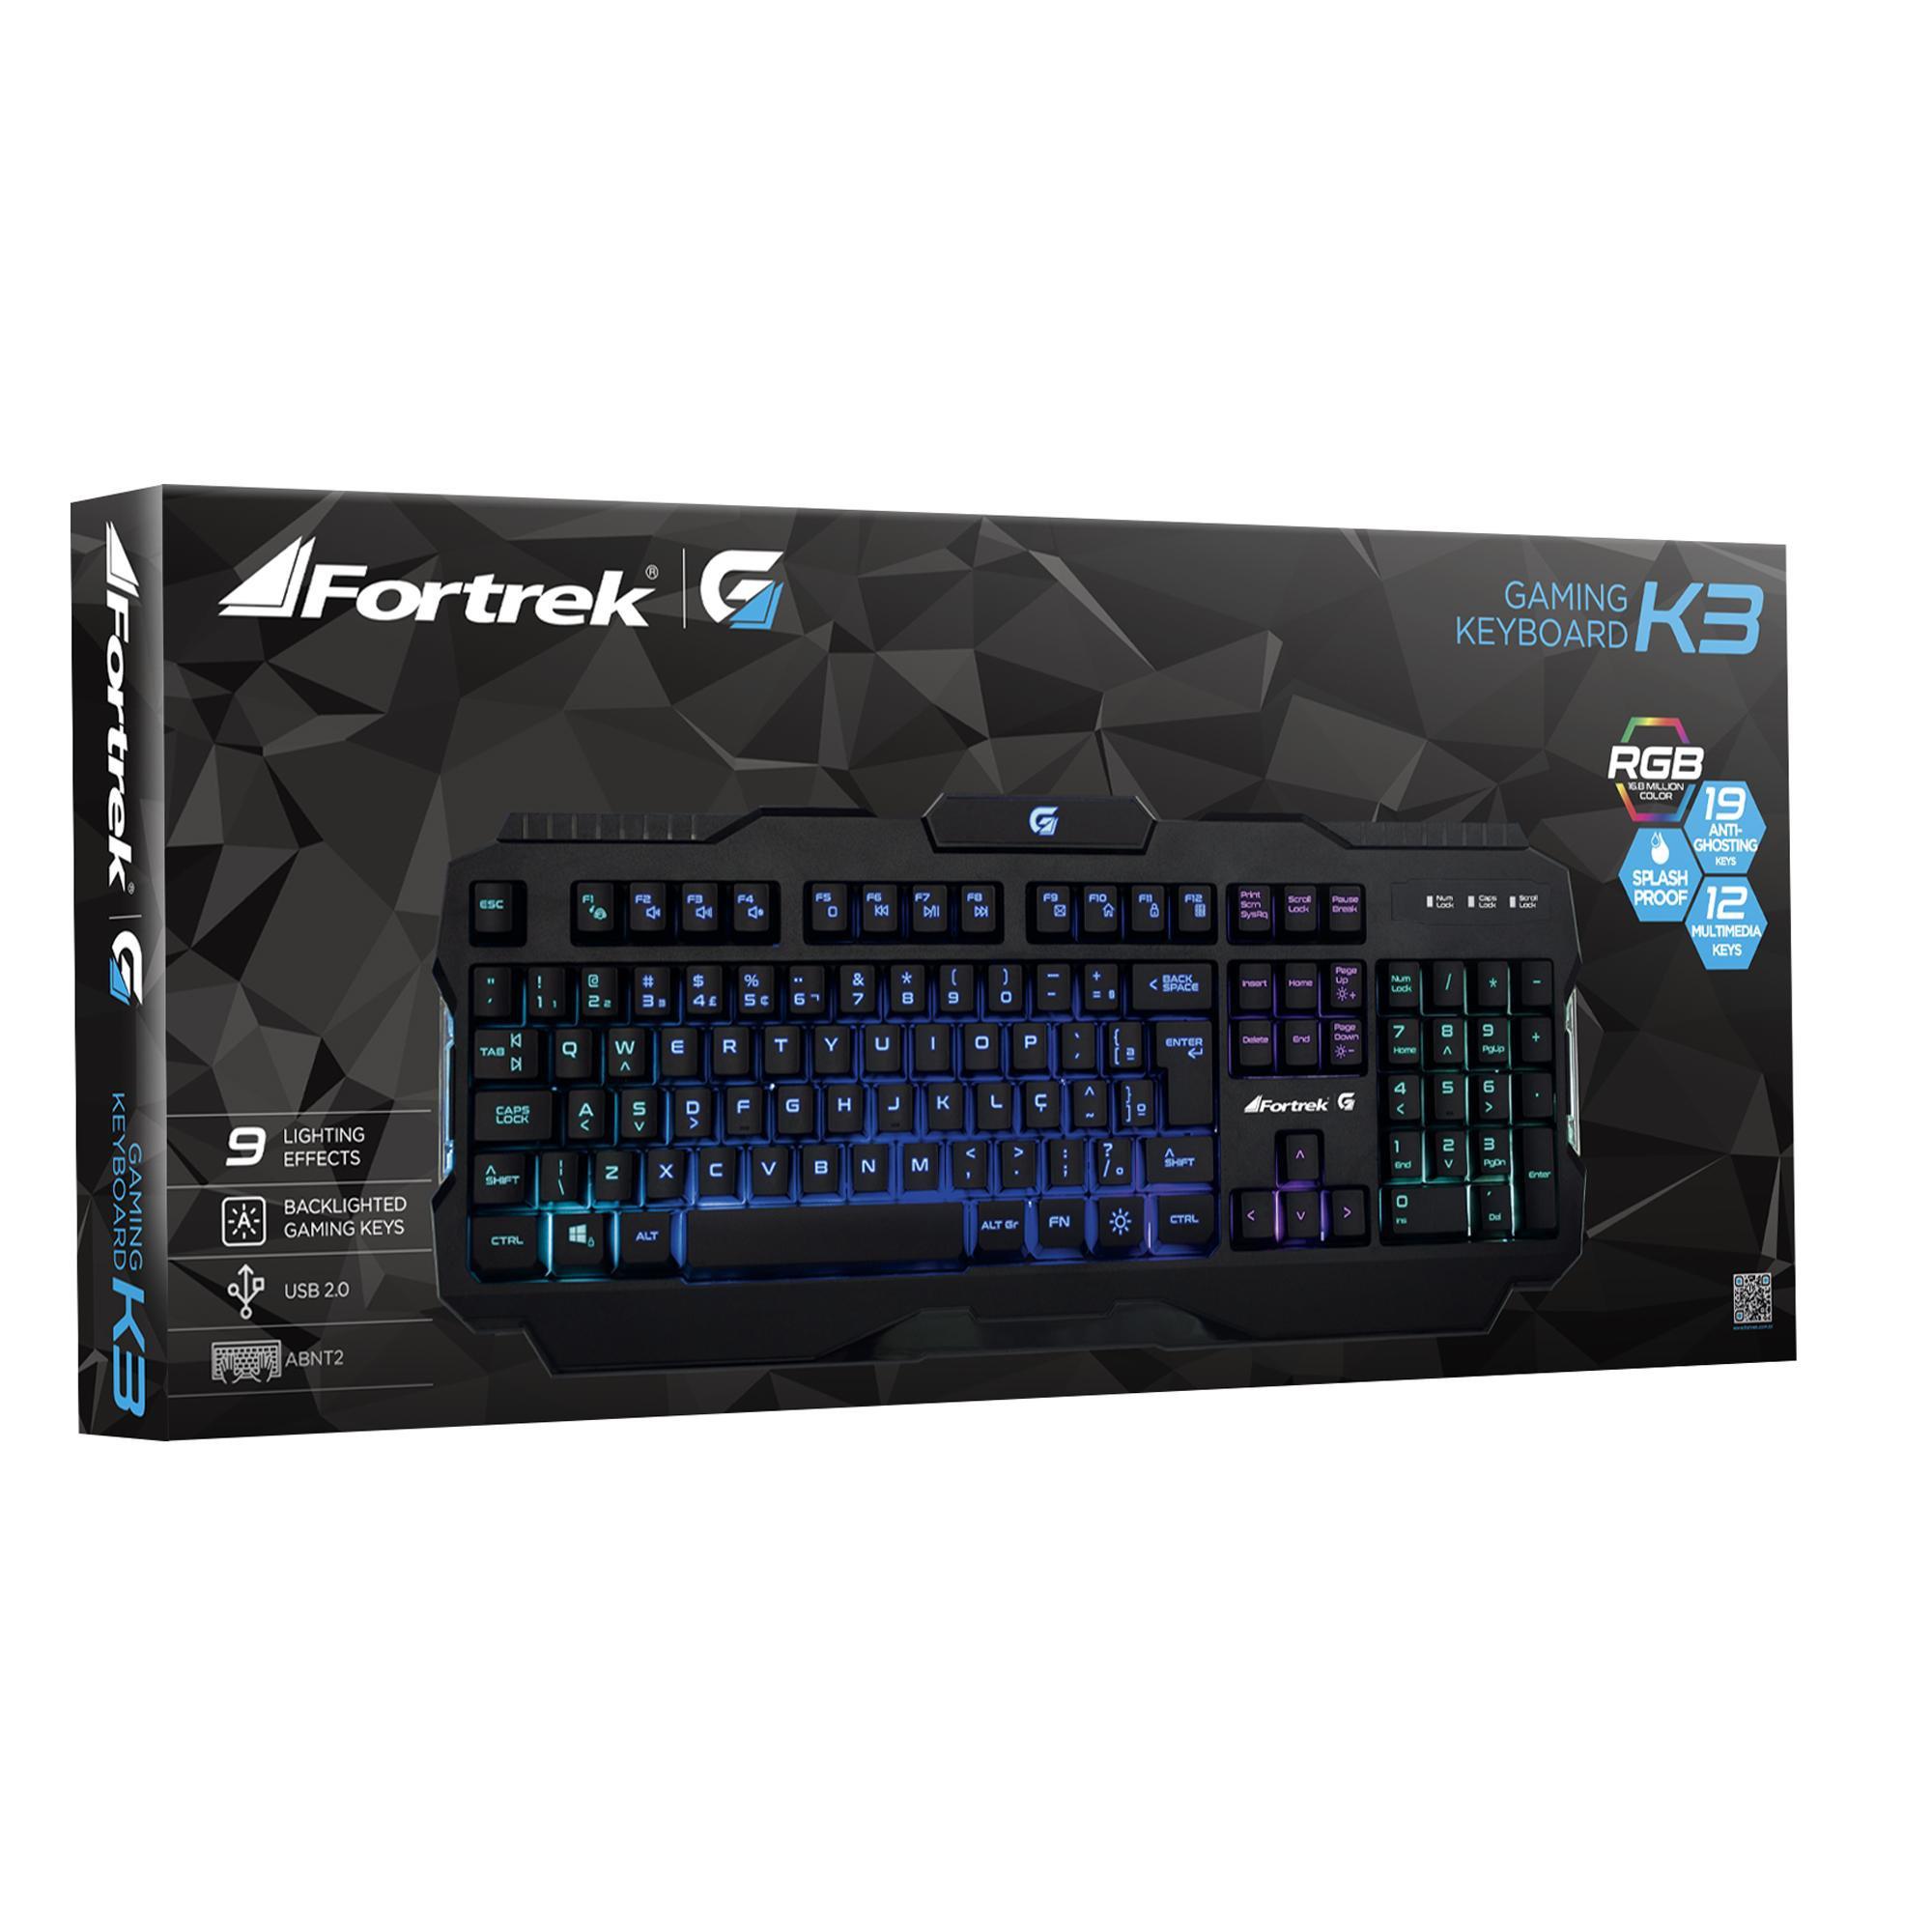 teclado gamer exclusivo fortrek rgb preto usb pro k3 47134 2000 196923 1